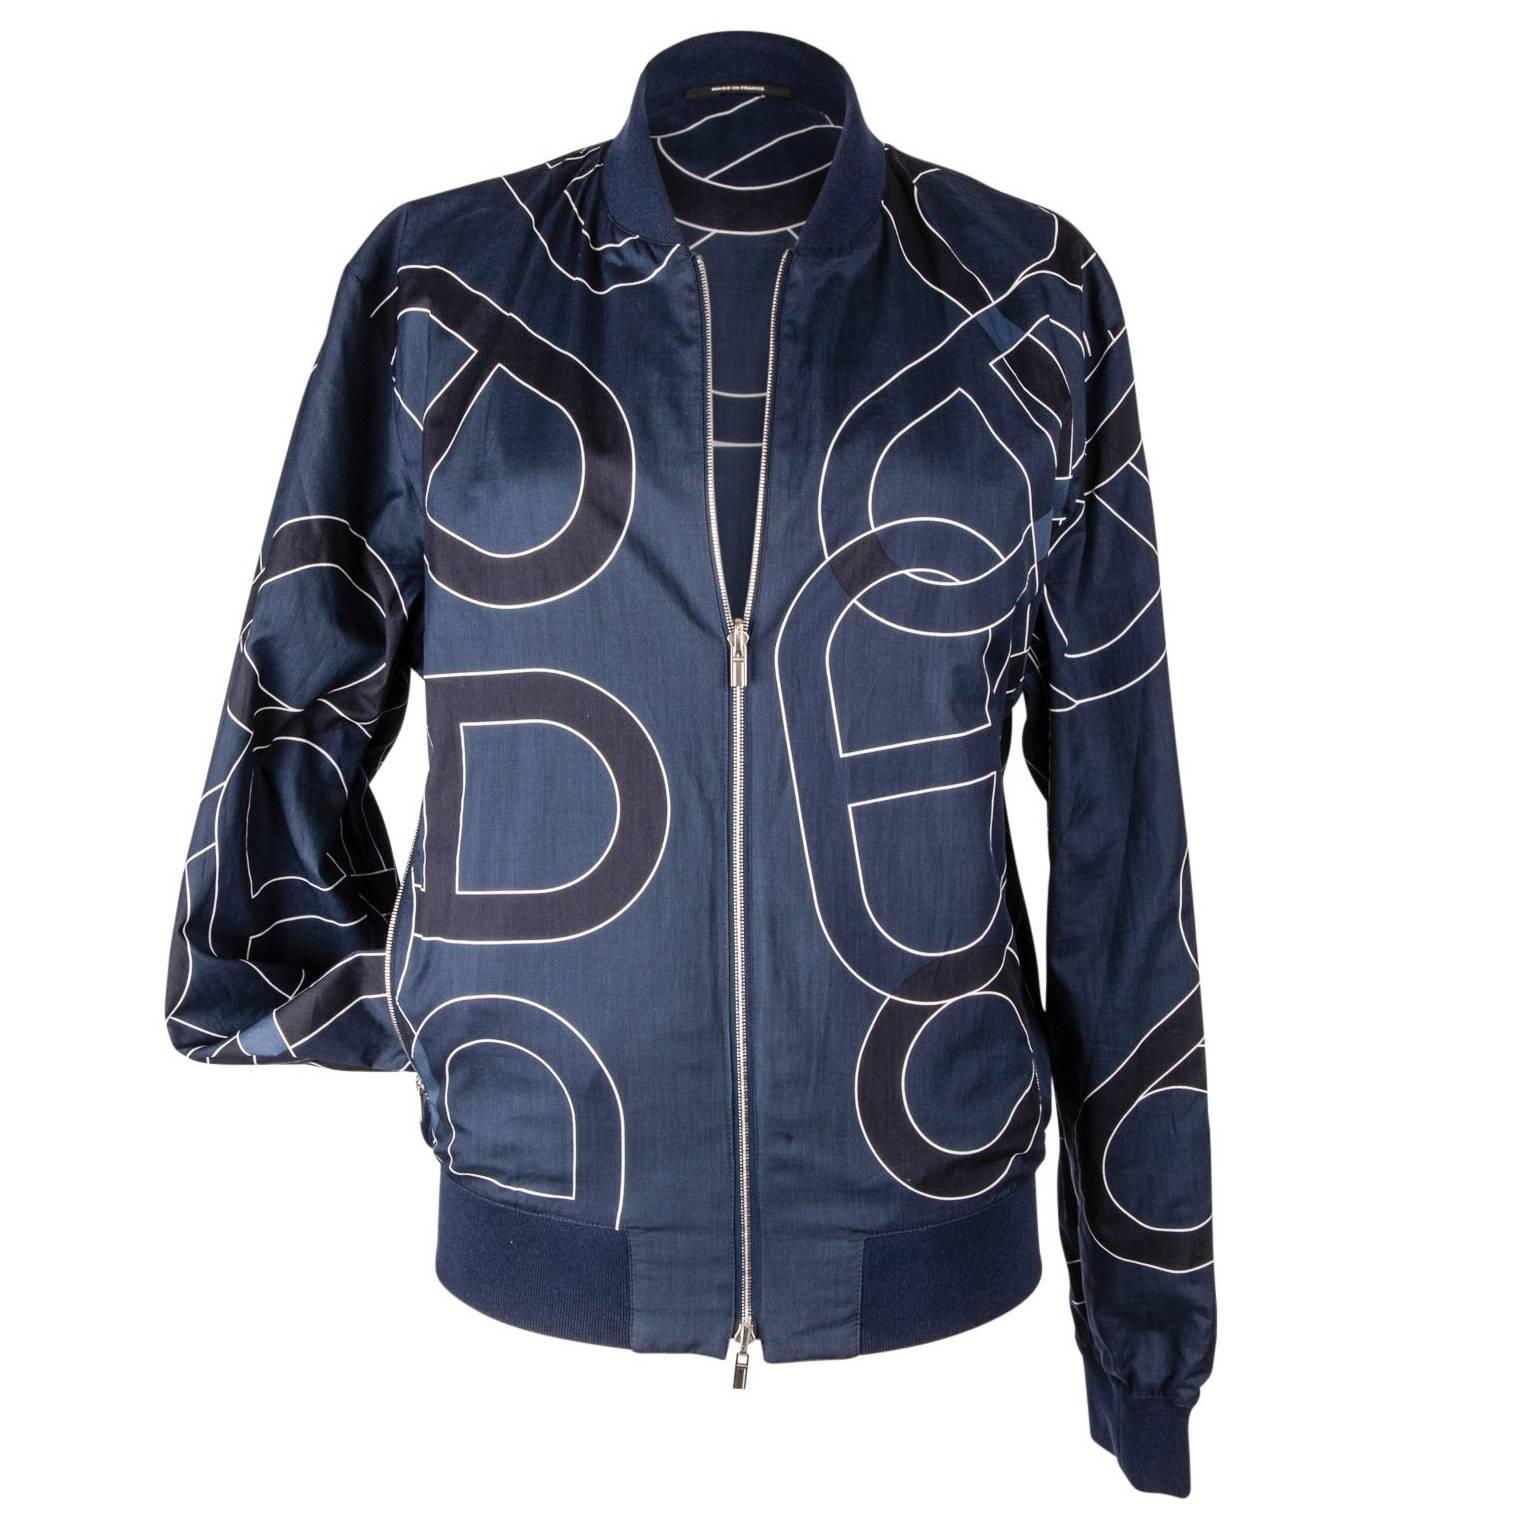 Hermes Men's Jacket Chaine D'Ancre Design Blue Reversible Windbreaker 50 nwt